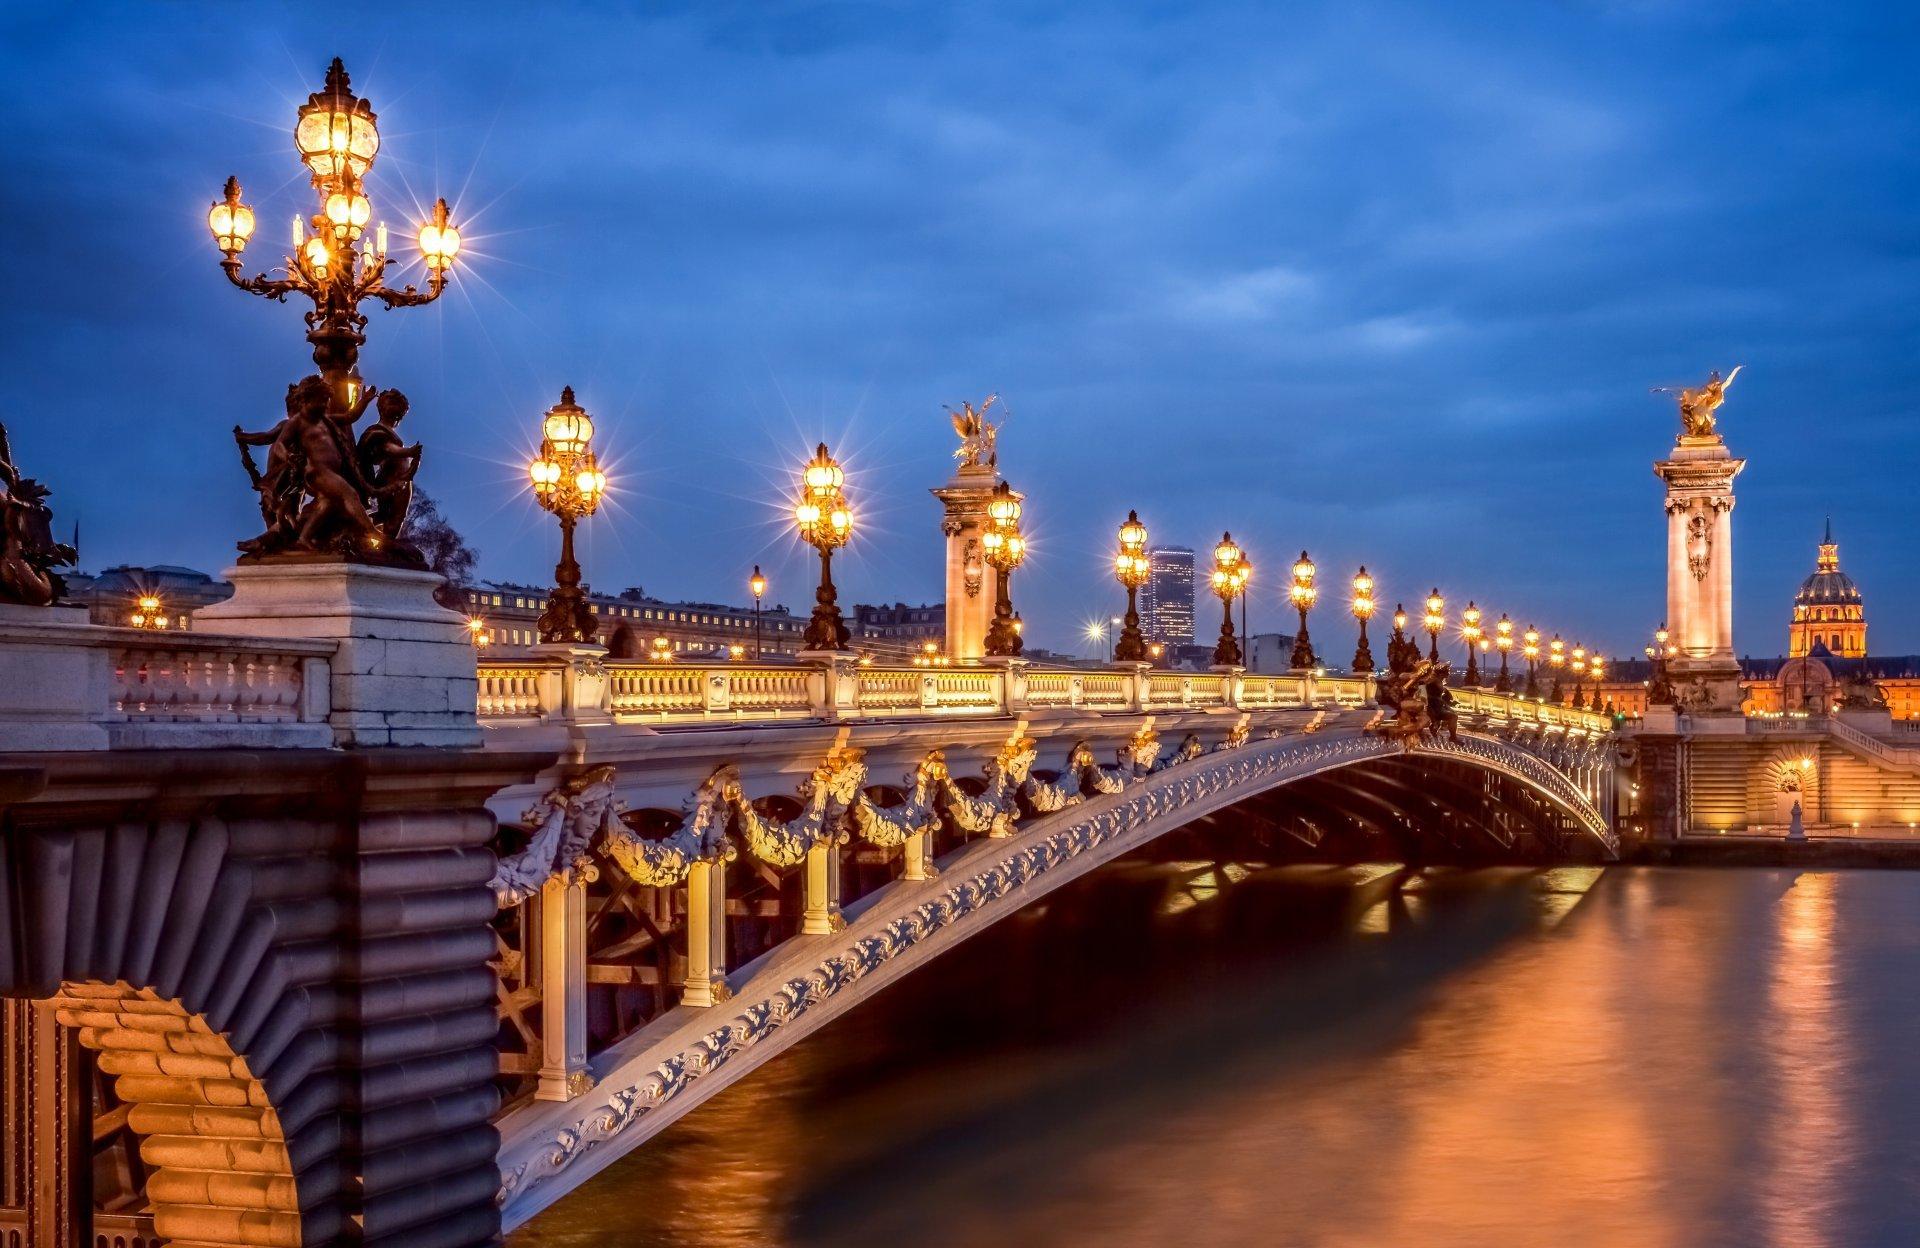 Alexandre III Bridge 1 famous bridges in Paris